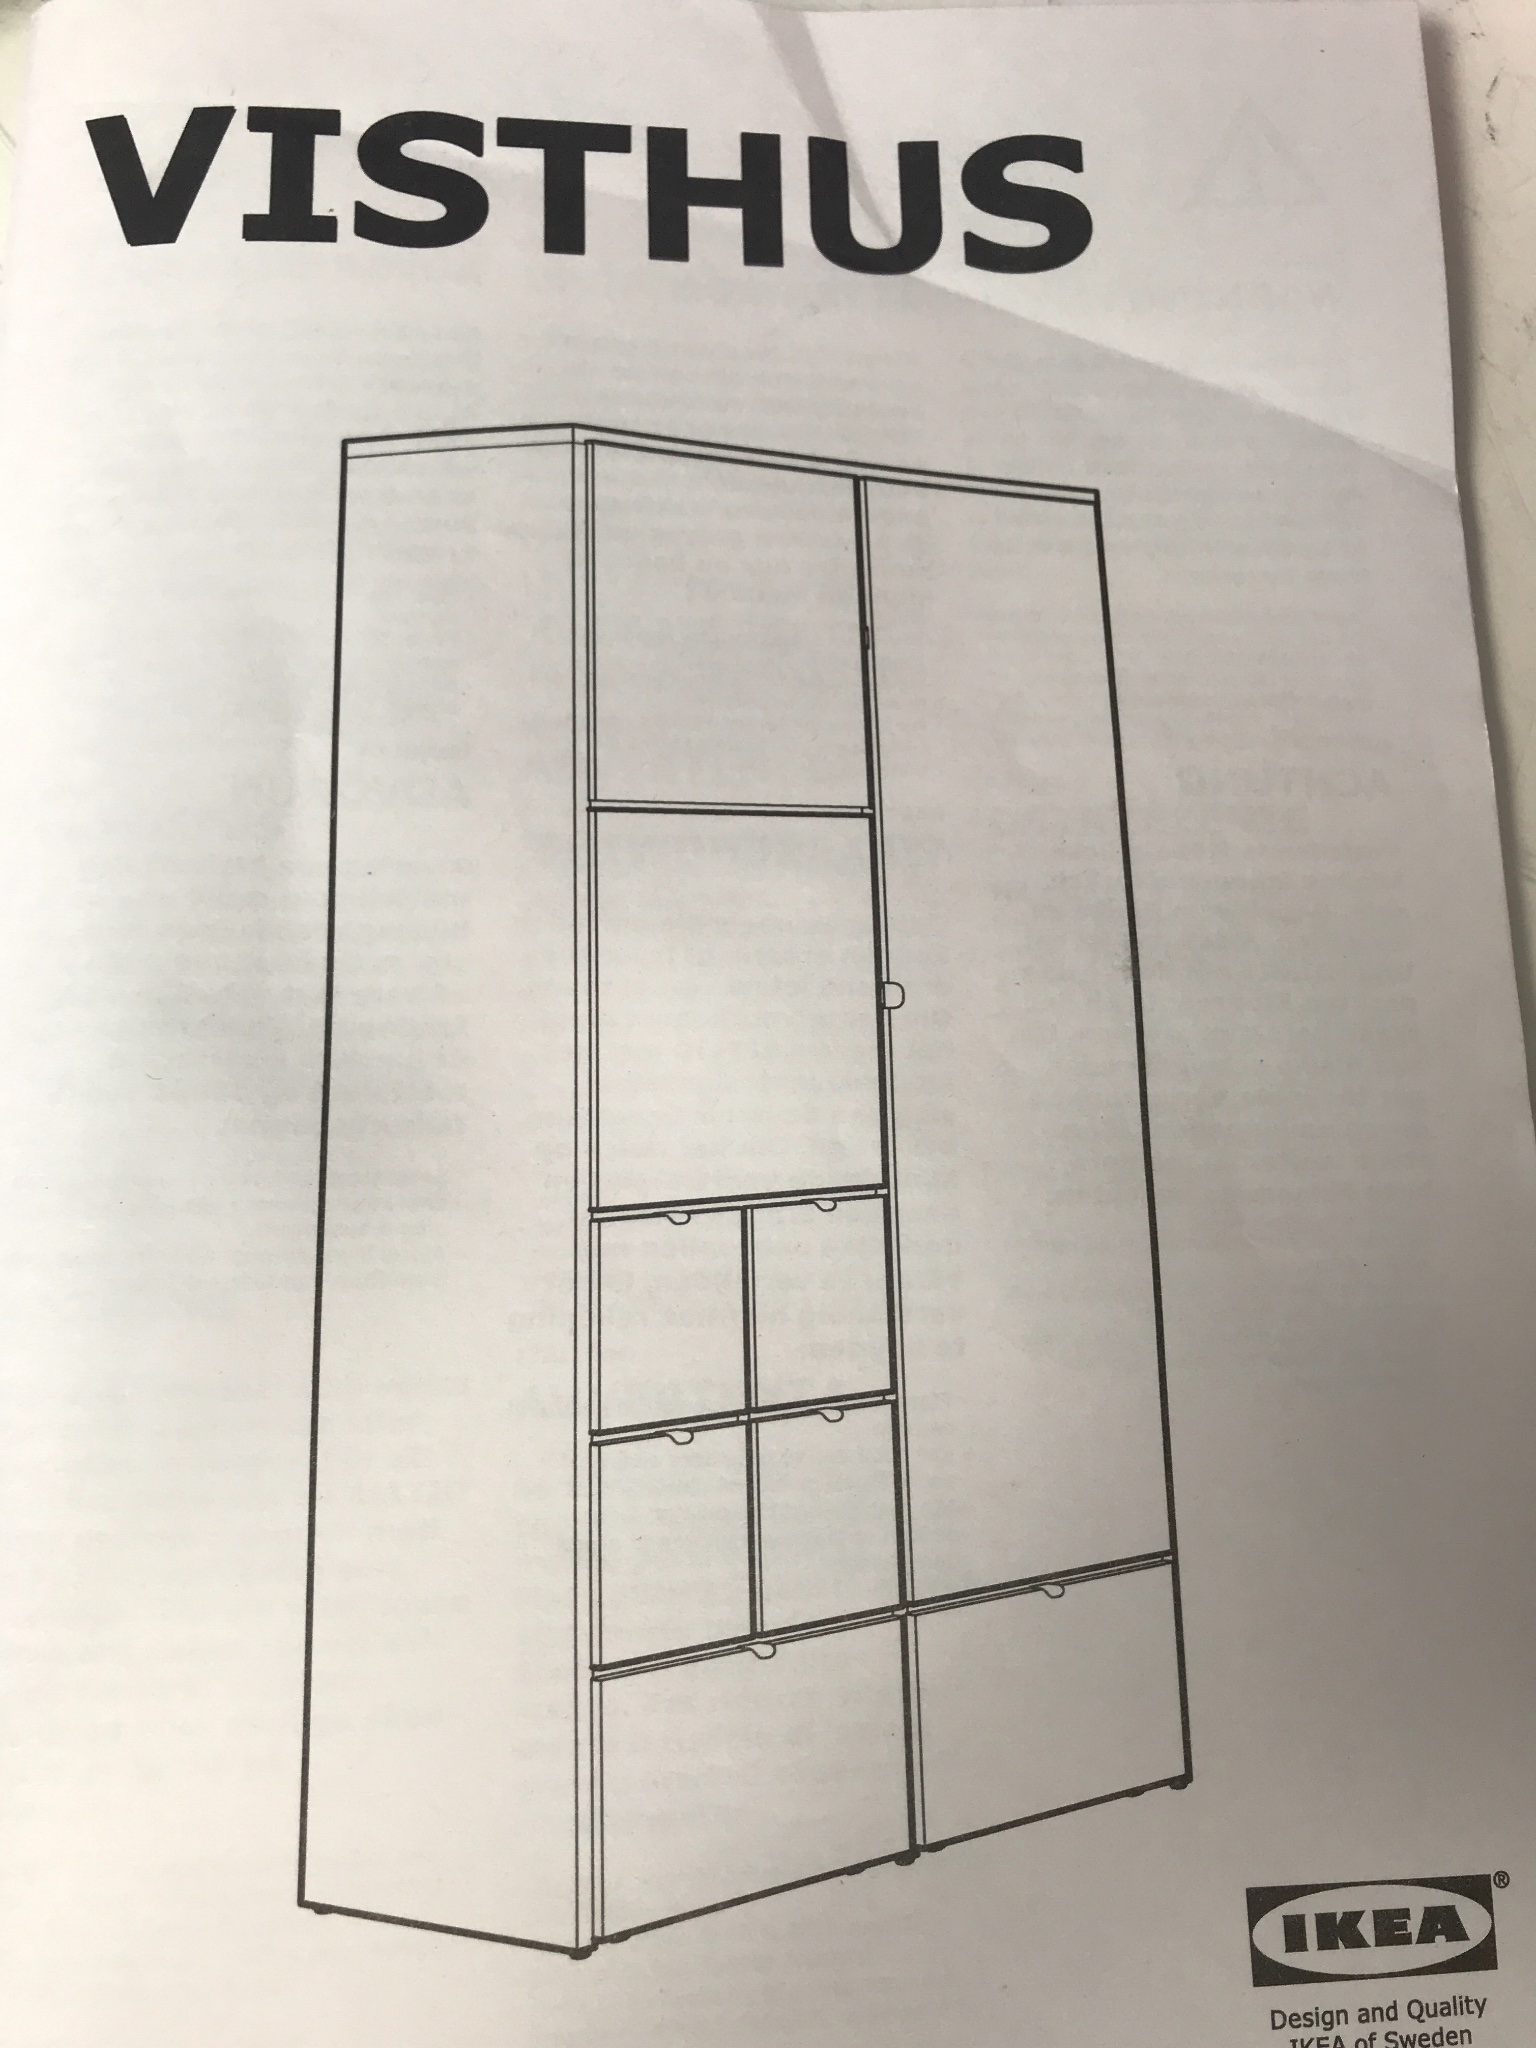 2x Ikea Visthus Kasten Monteren Werkspot